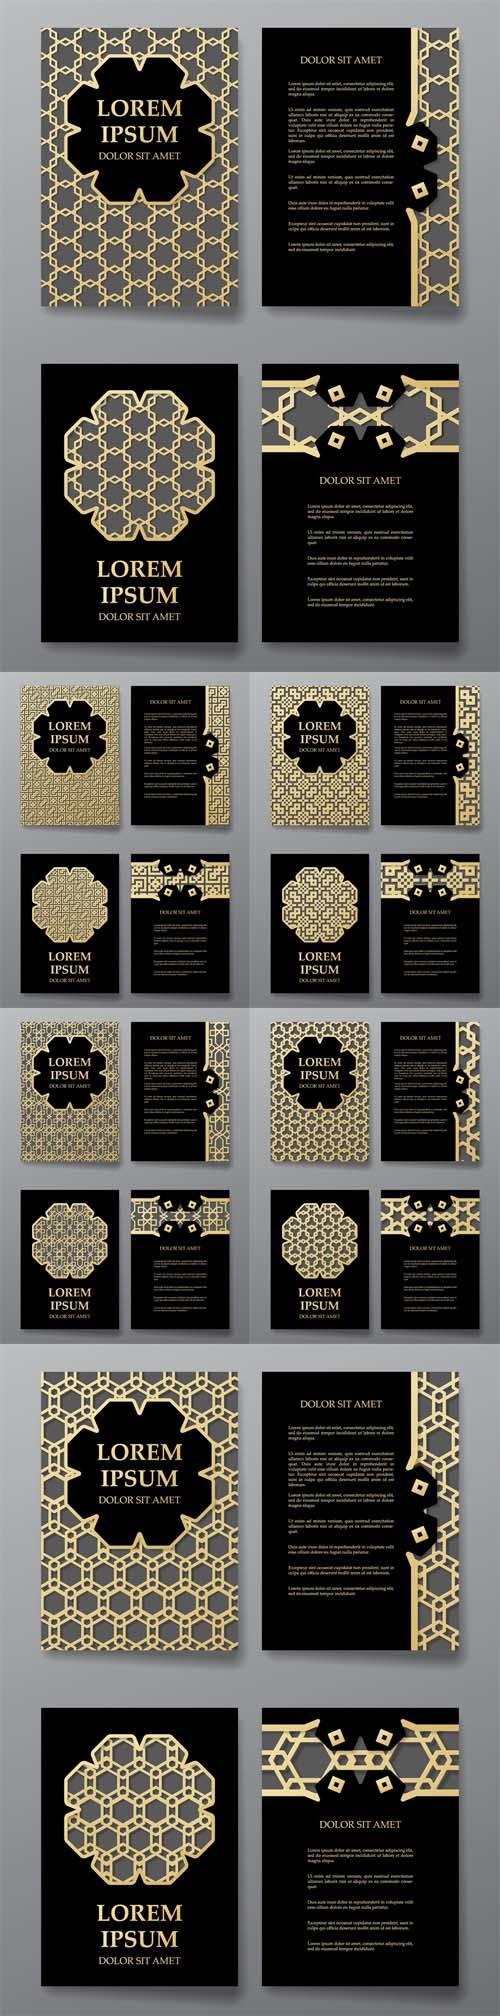 Vector Cover brochure gold design. Arabic traditional decorative elements